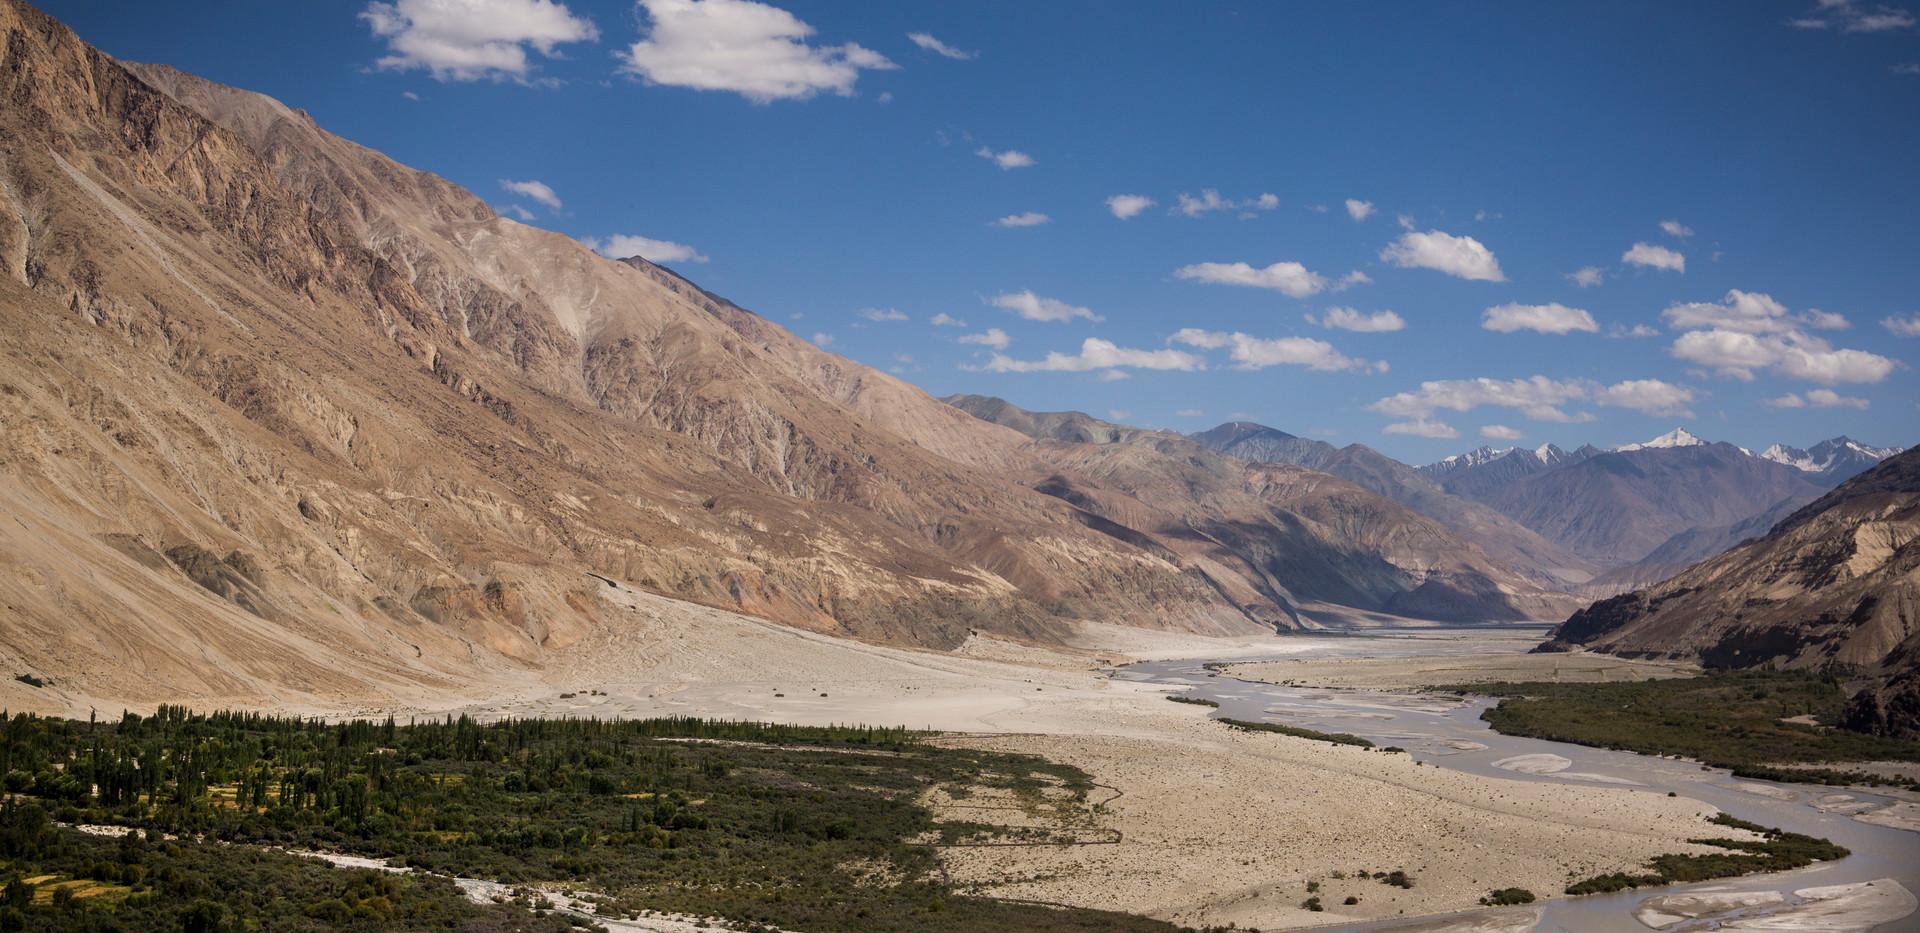 HimalayanValley.jpg